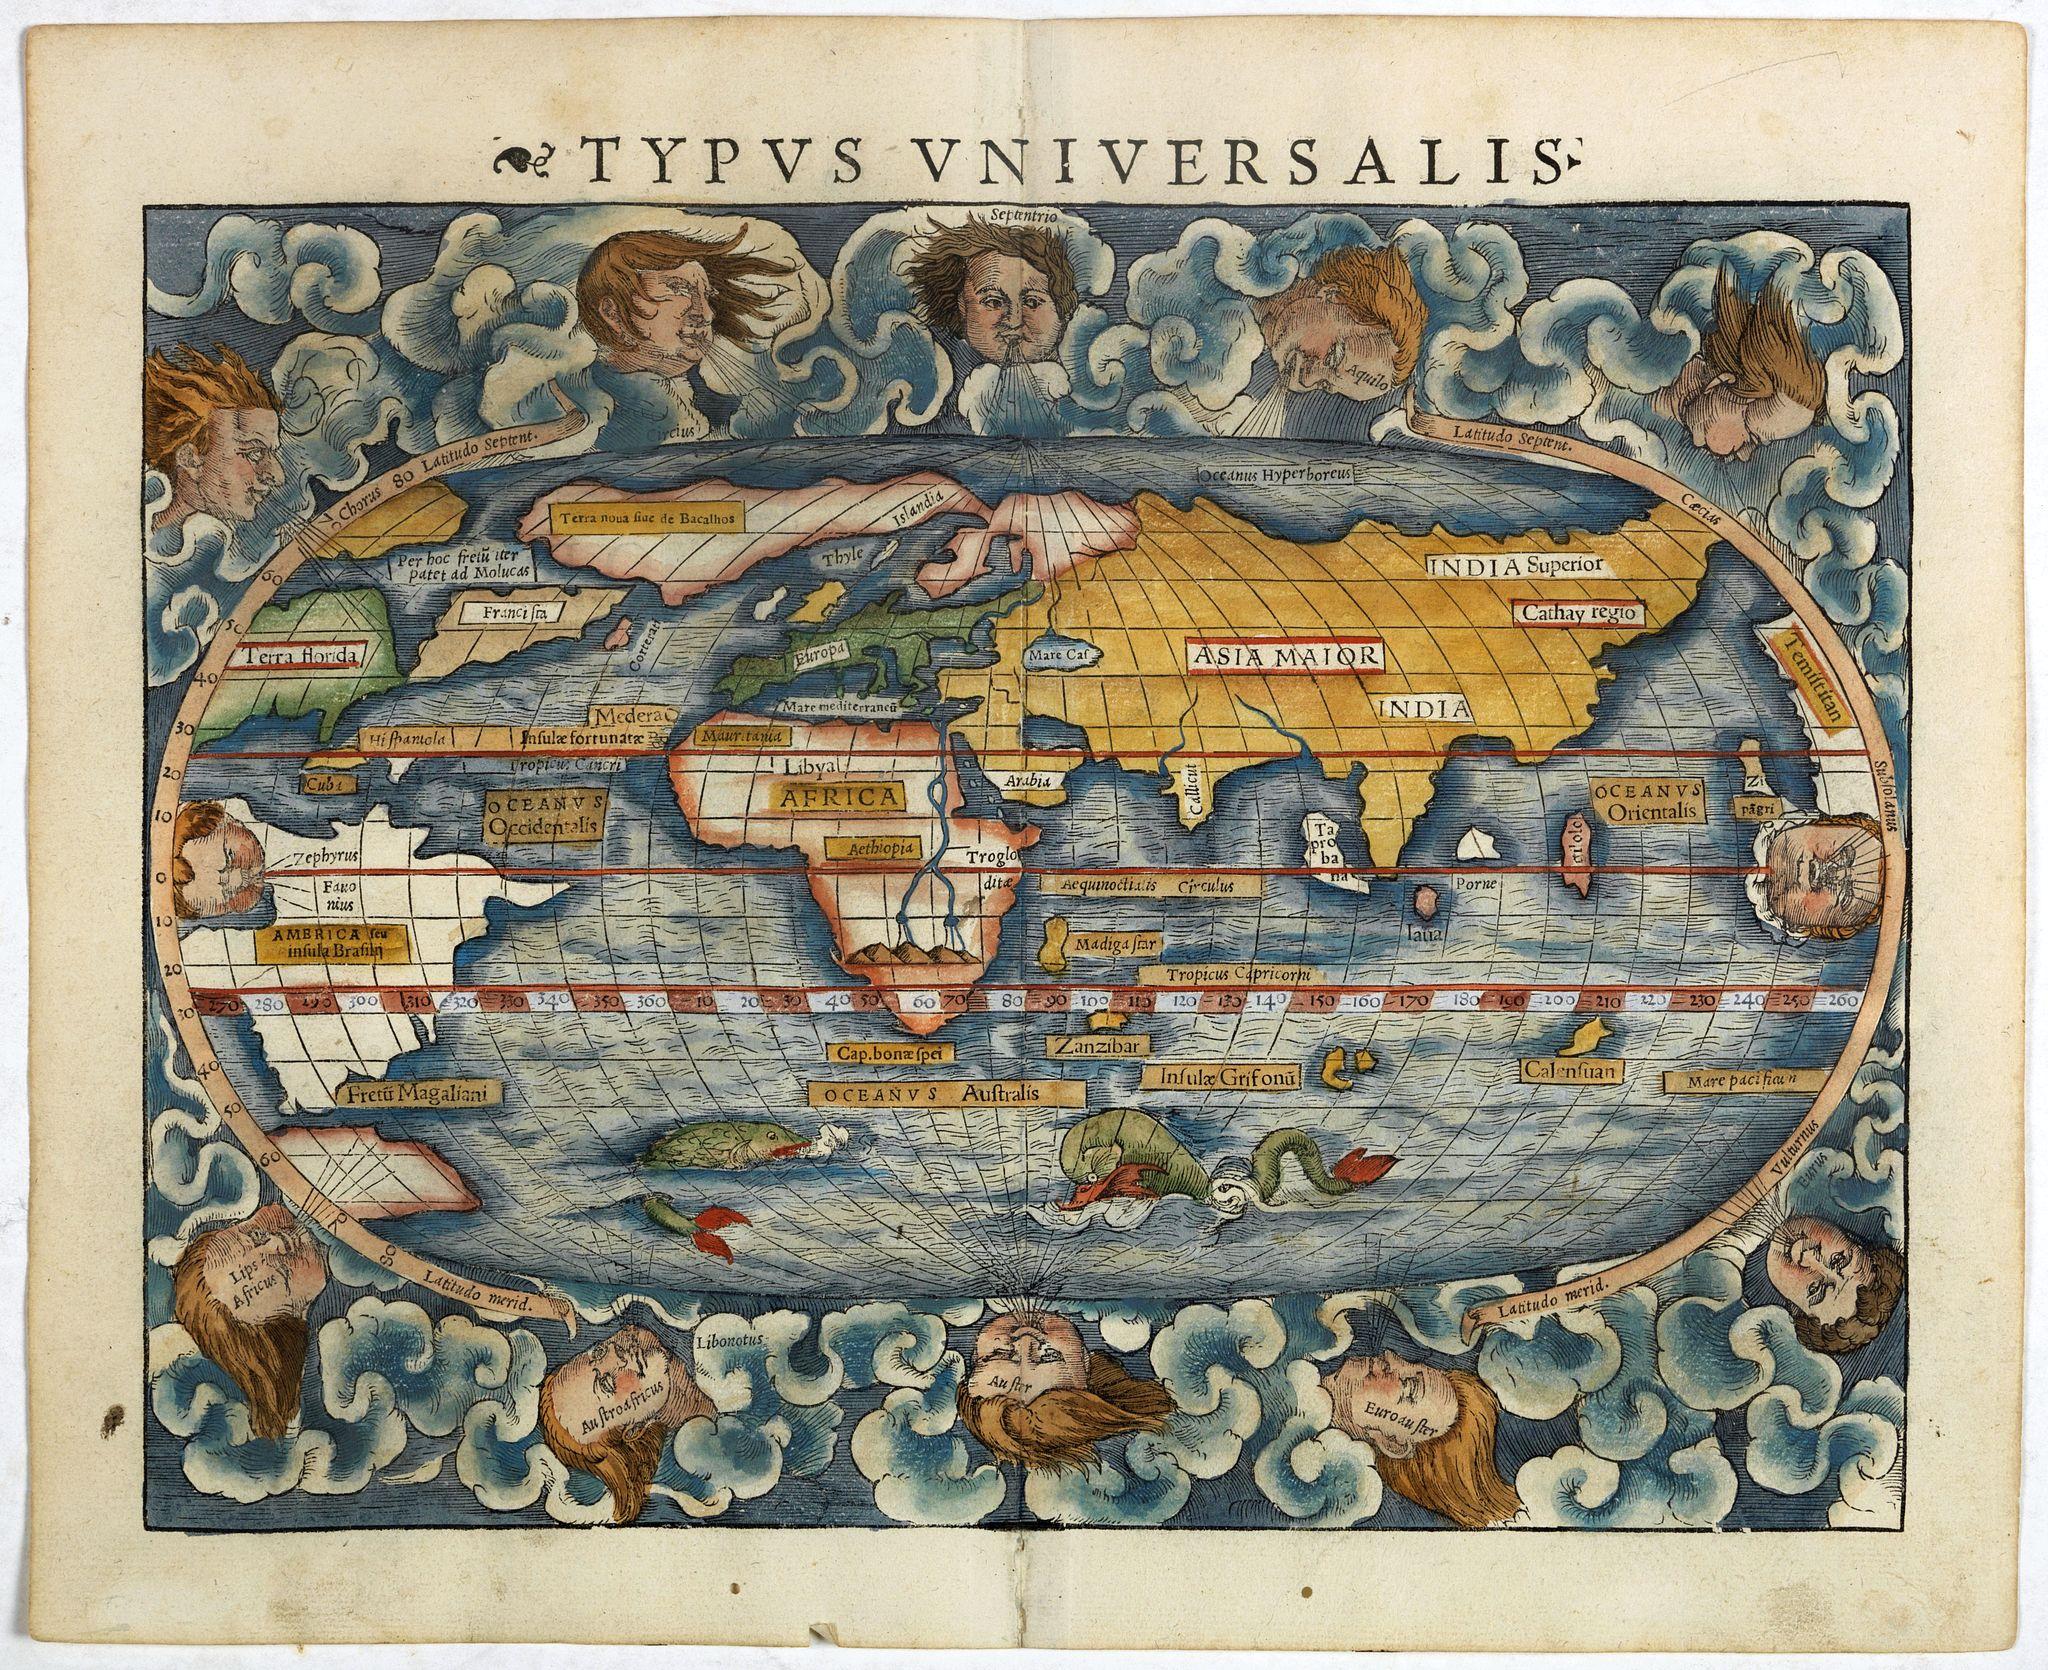 MÜNSTER, S. -  [World map]  Typus Universalis.